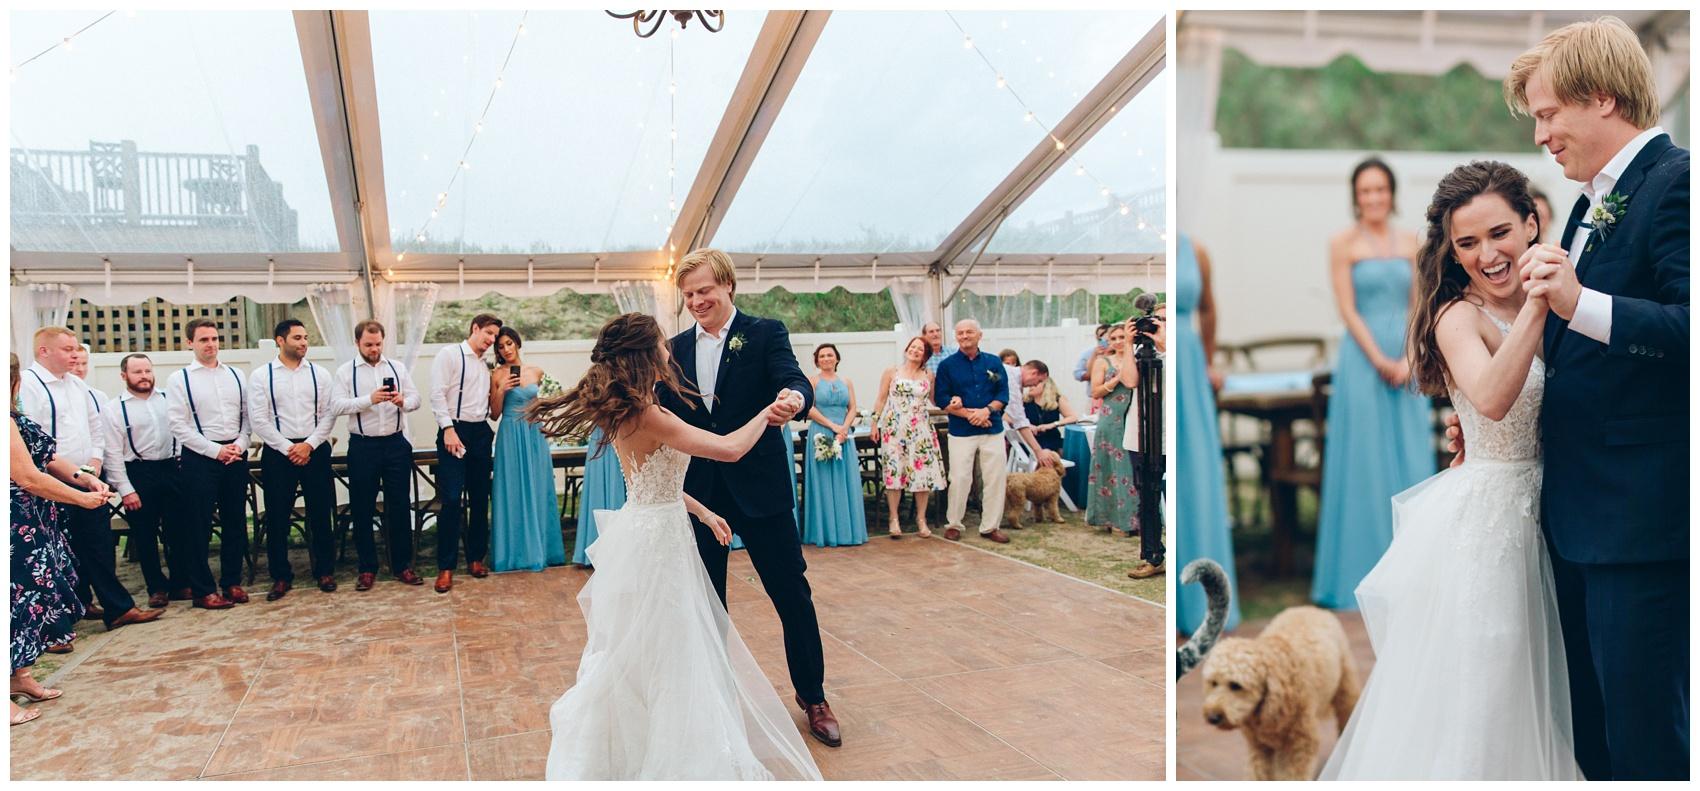 Outer-Banks-Corolla-Wedding_0104.jpg